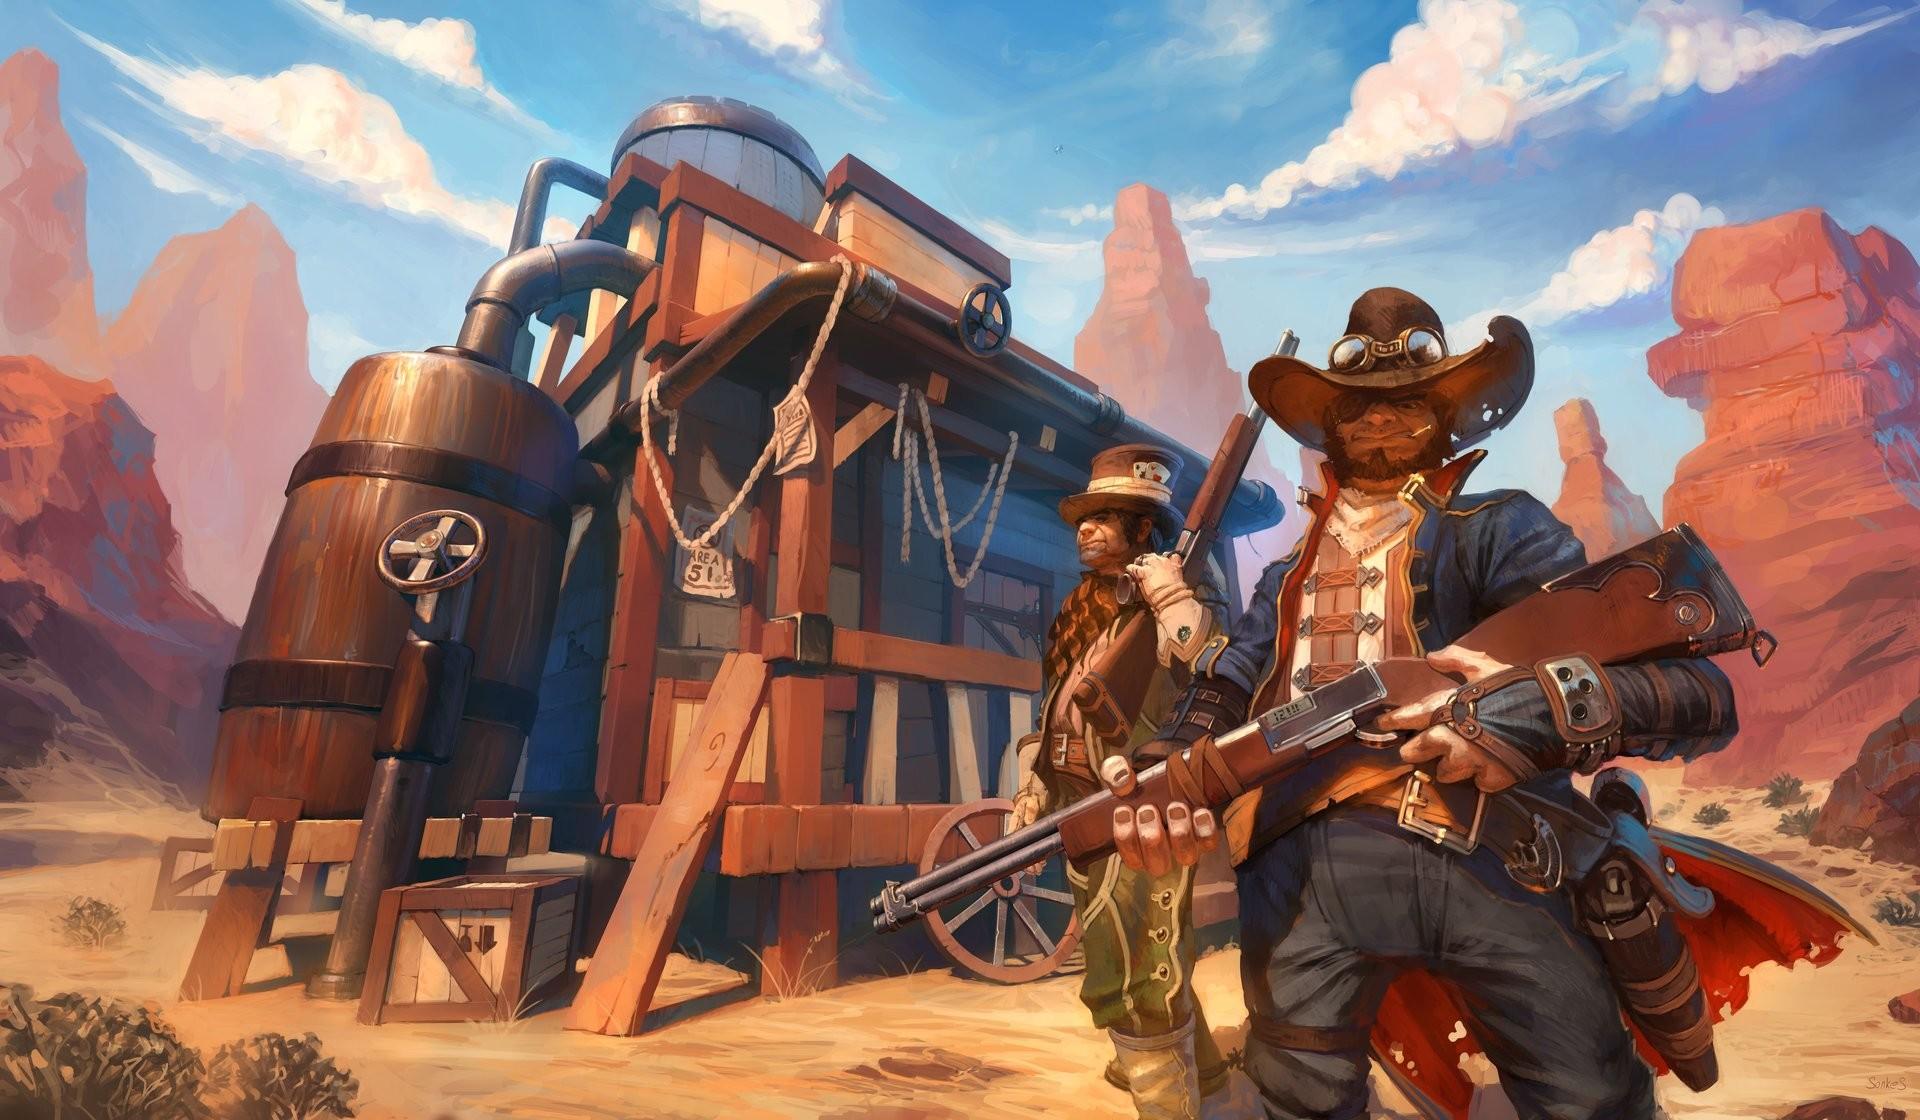 cowboy-western-concept-art-illustration-01-ivan-smirnov-